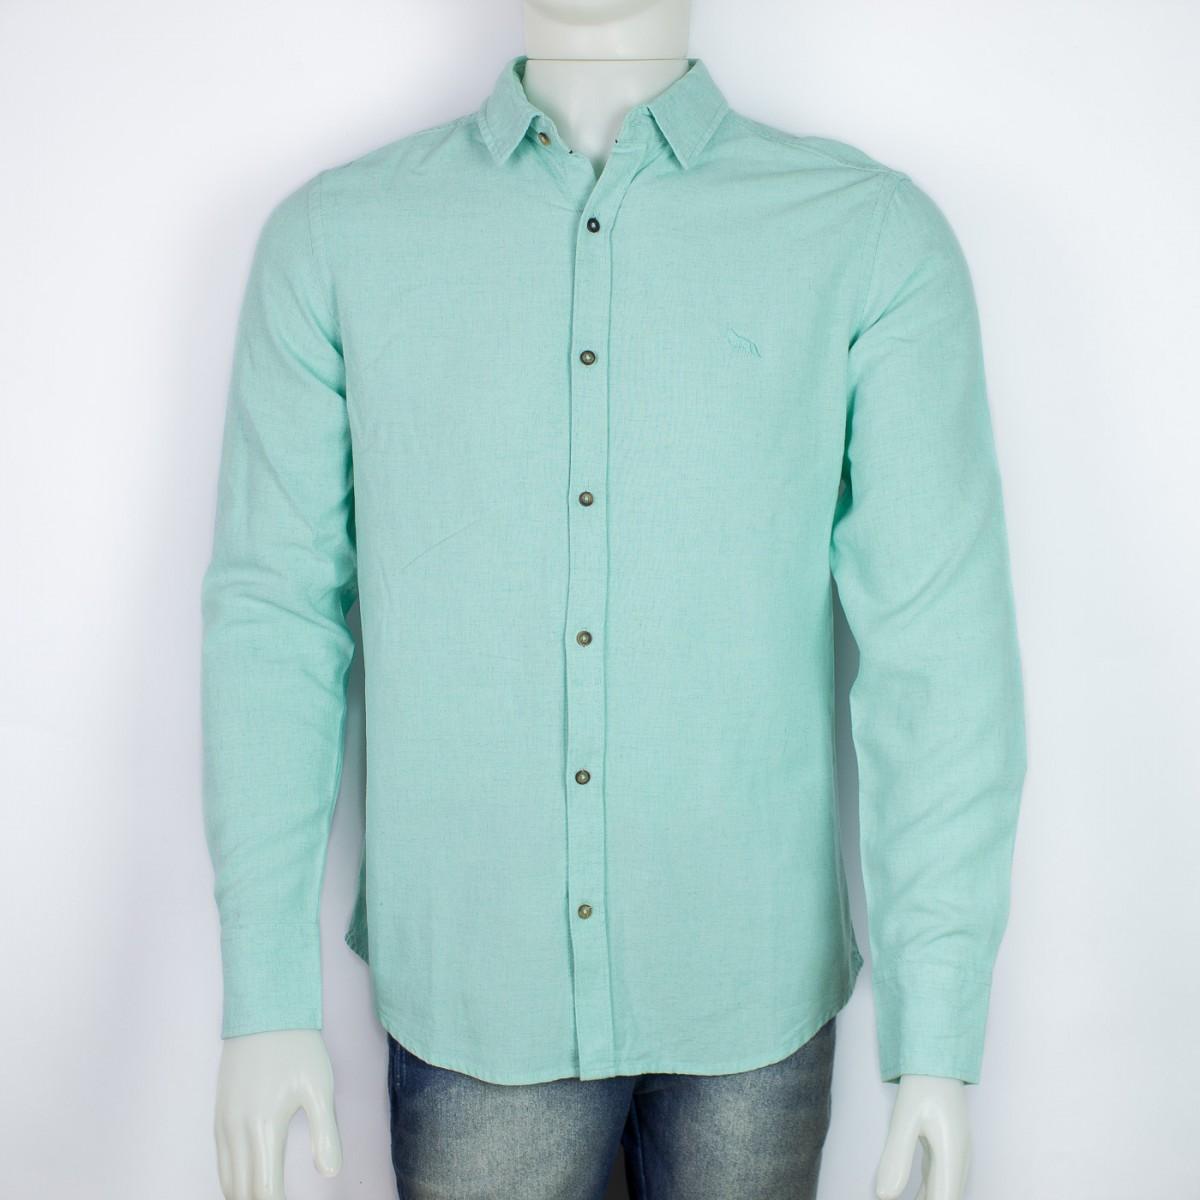 2c24b45480 Bizz Store - Camisa Social Masculina Acostamento Verde Viscose